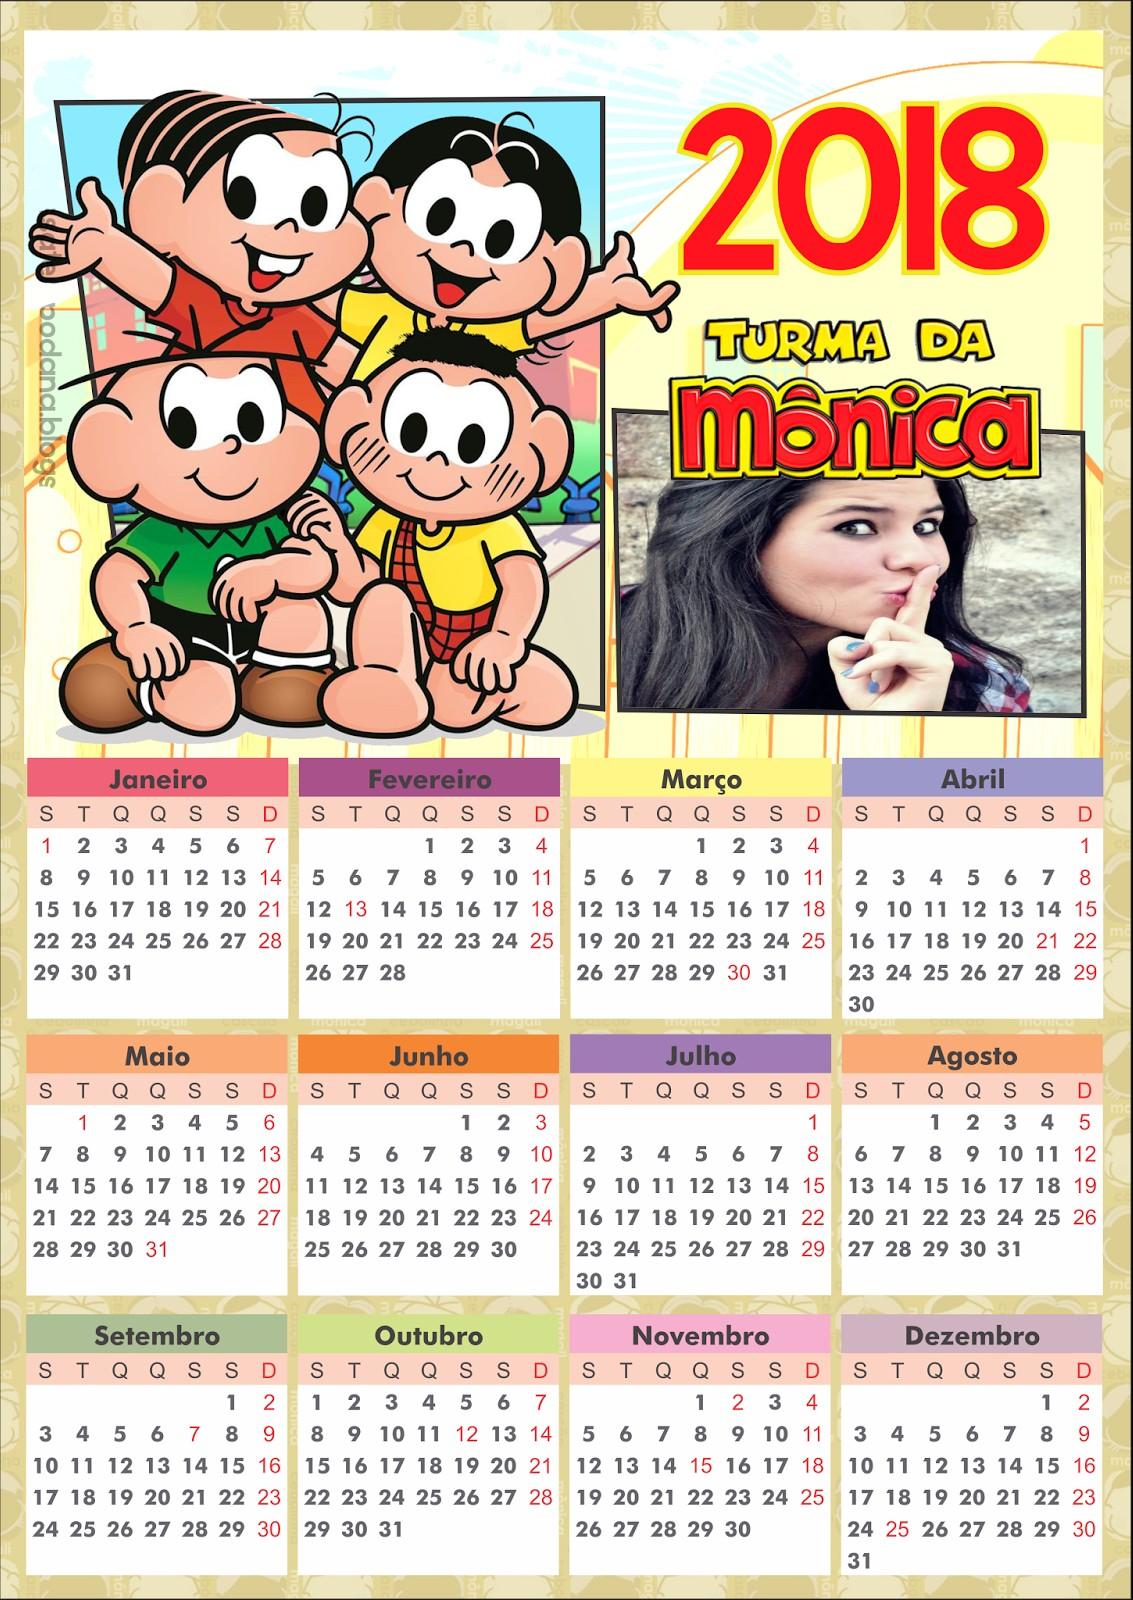 calendario-2018-turma-da-monica